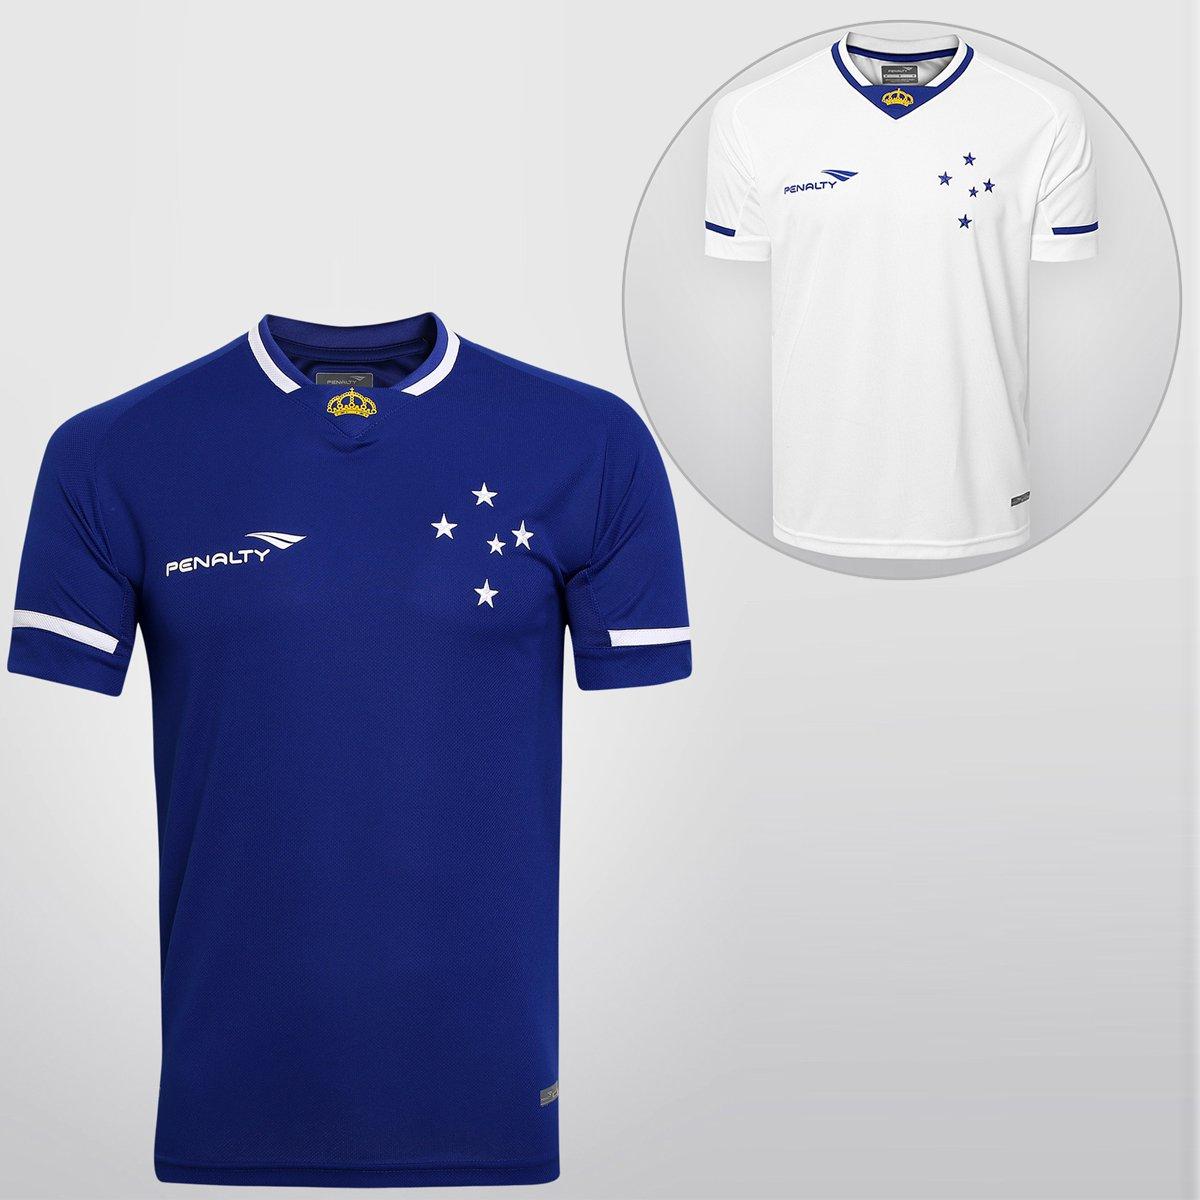 Kit Penalty Cruzeiro - Camisa I 15 16 s nº + Camisa II 15 16 s nº - Compre  Agora  7871e5969abf3